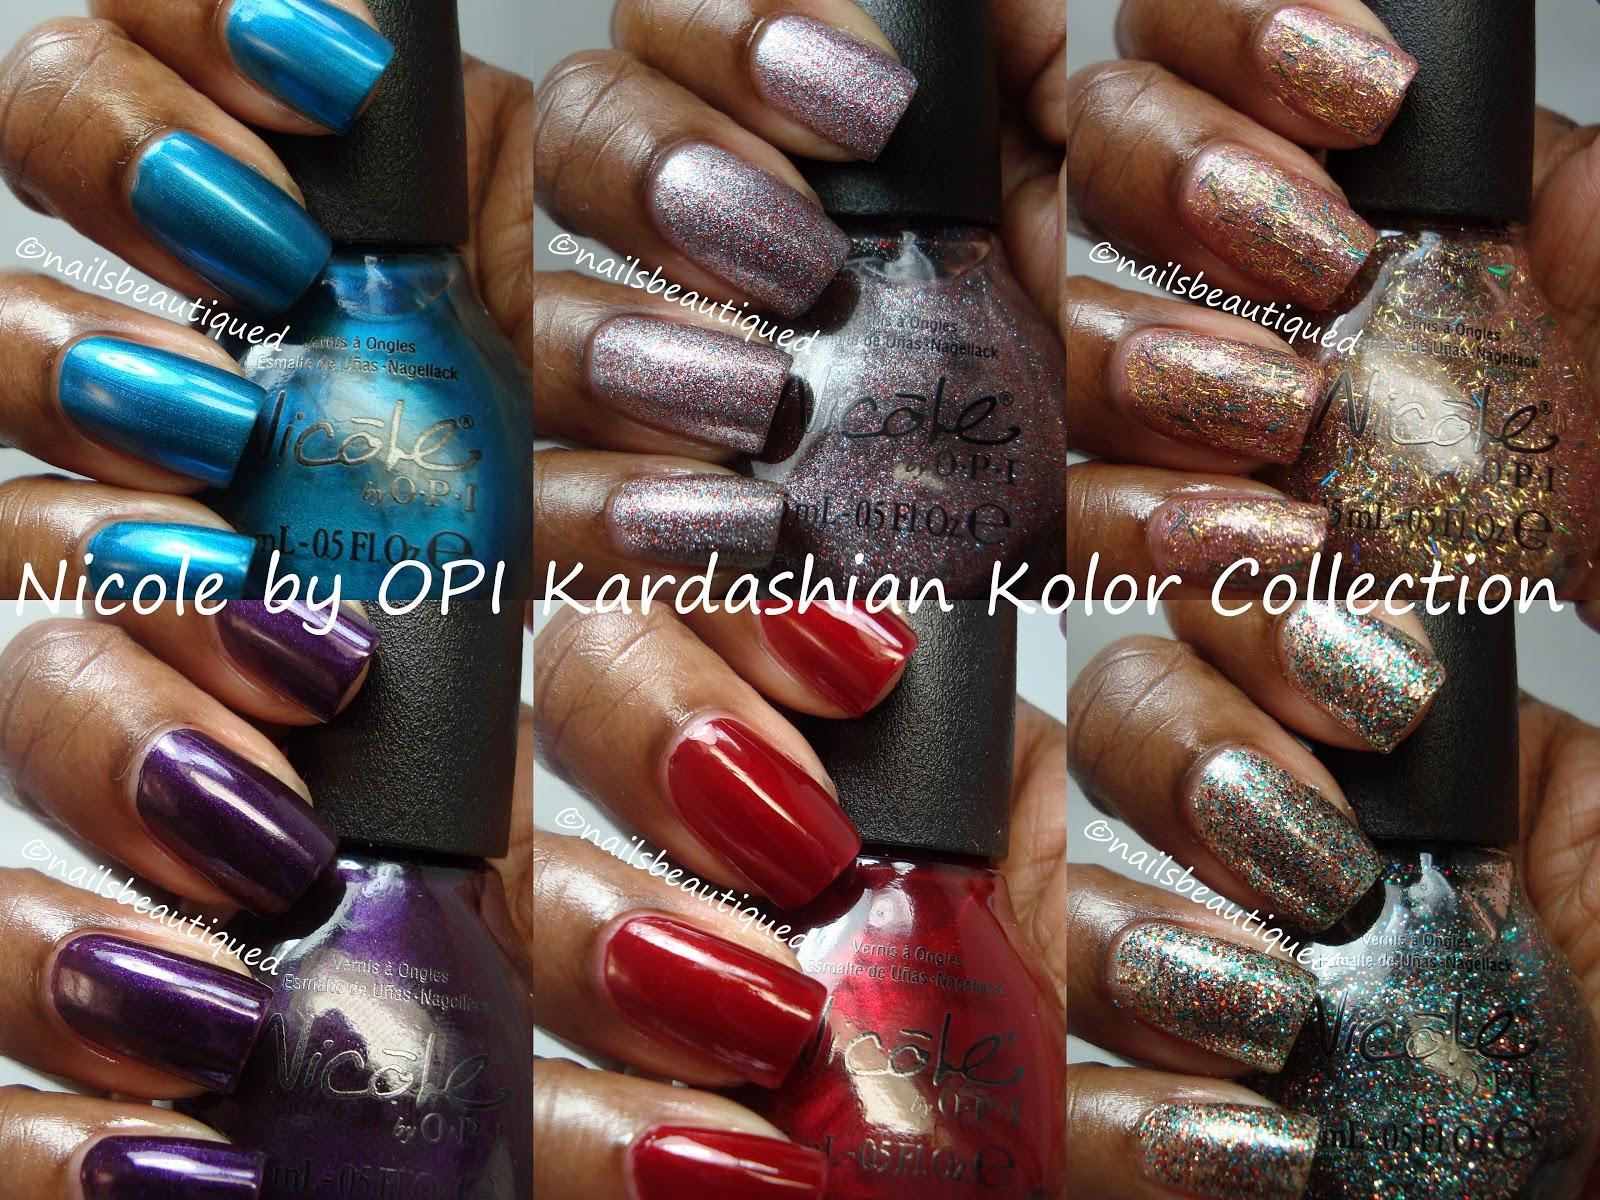 unbitten polish: Nicole By OPI Kardashian Kolor Holiday 2012 ...